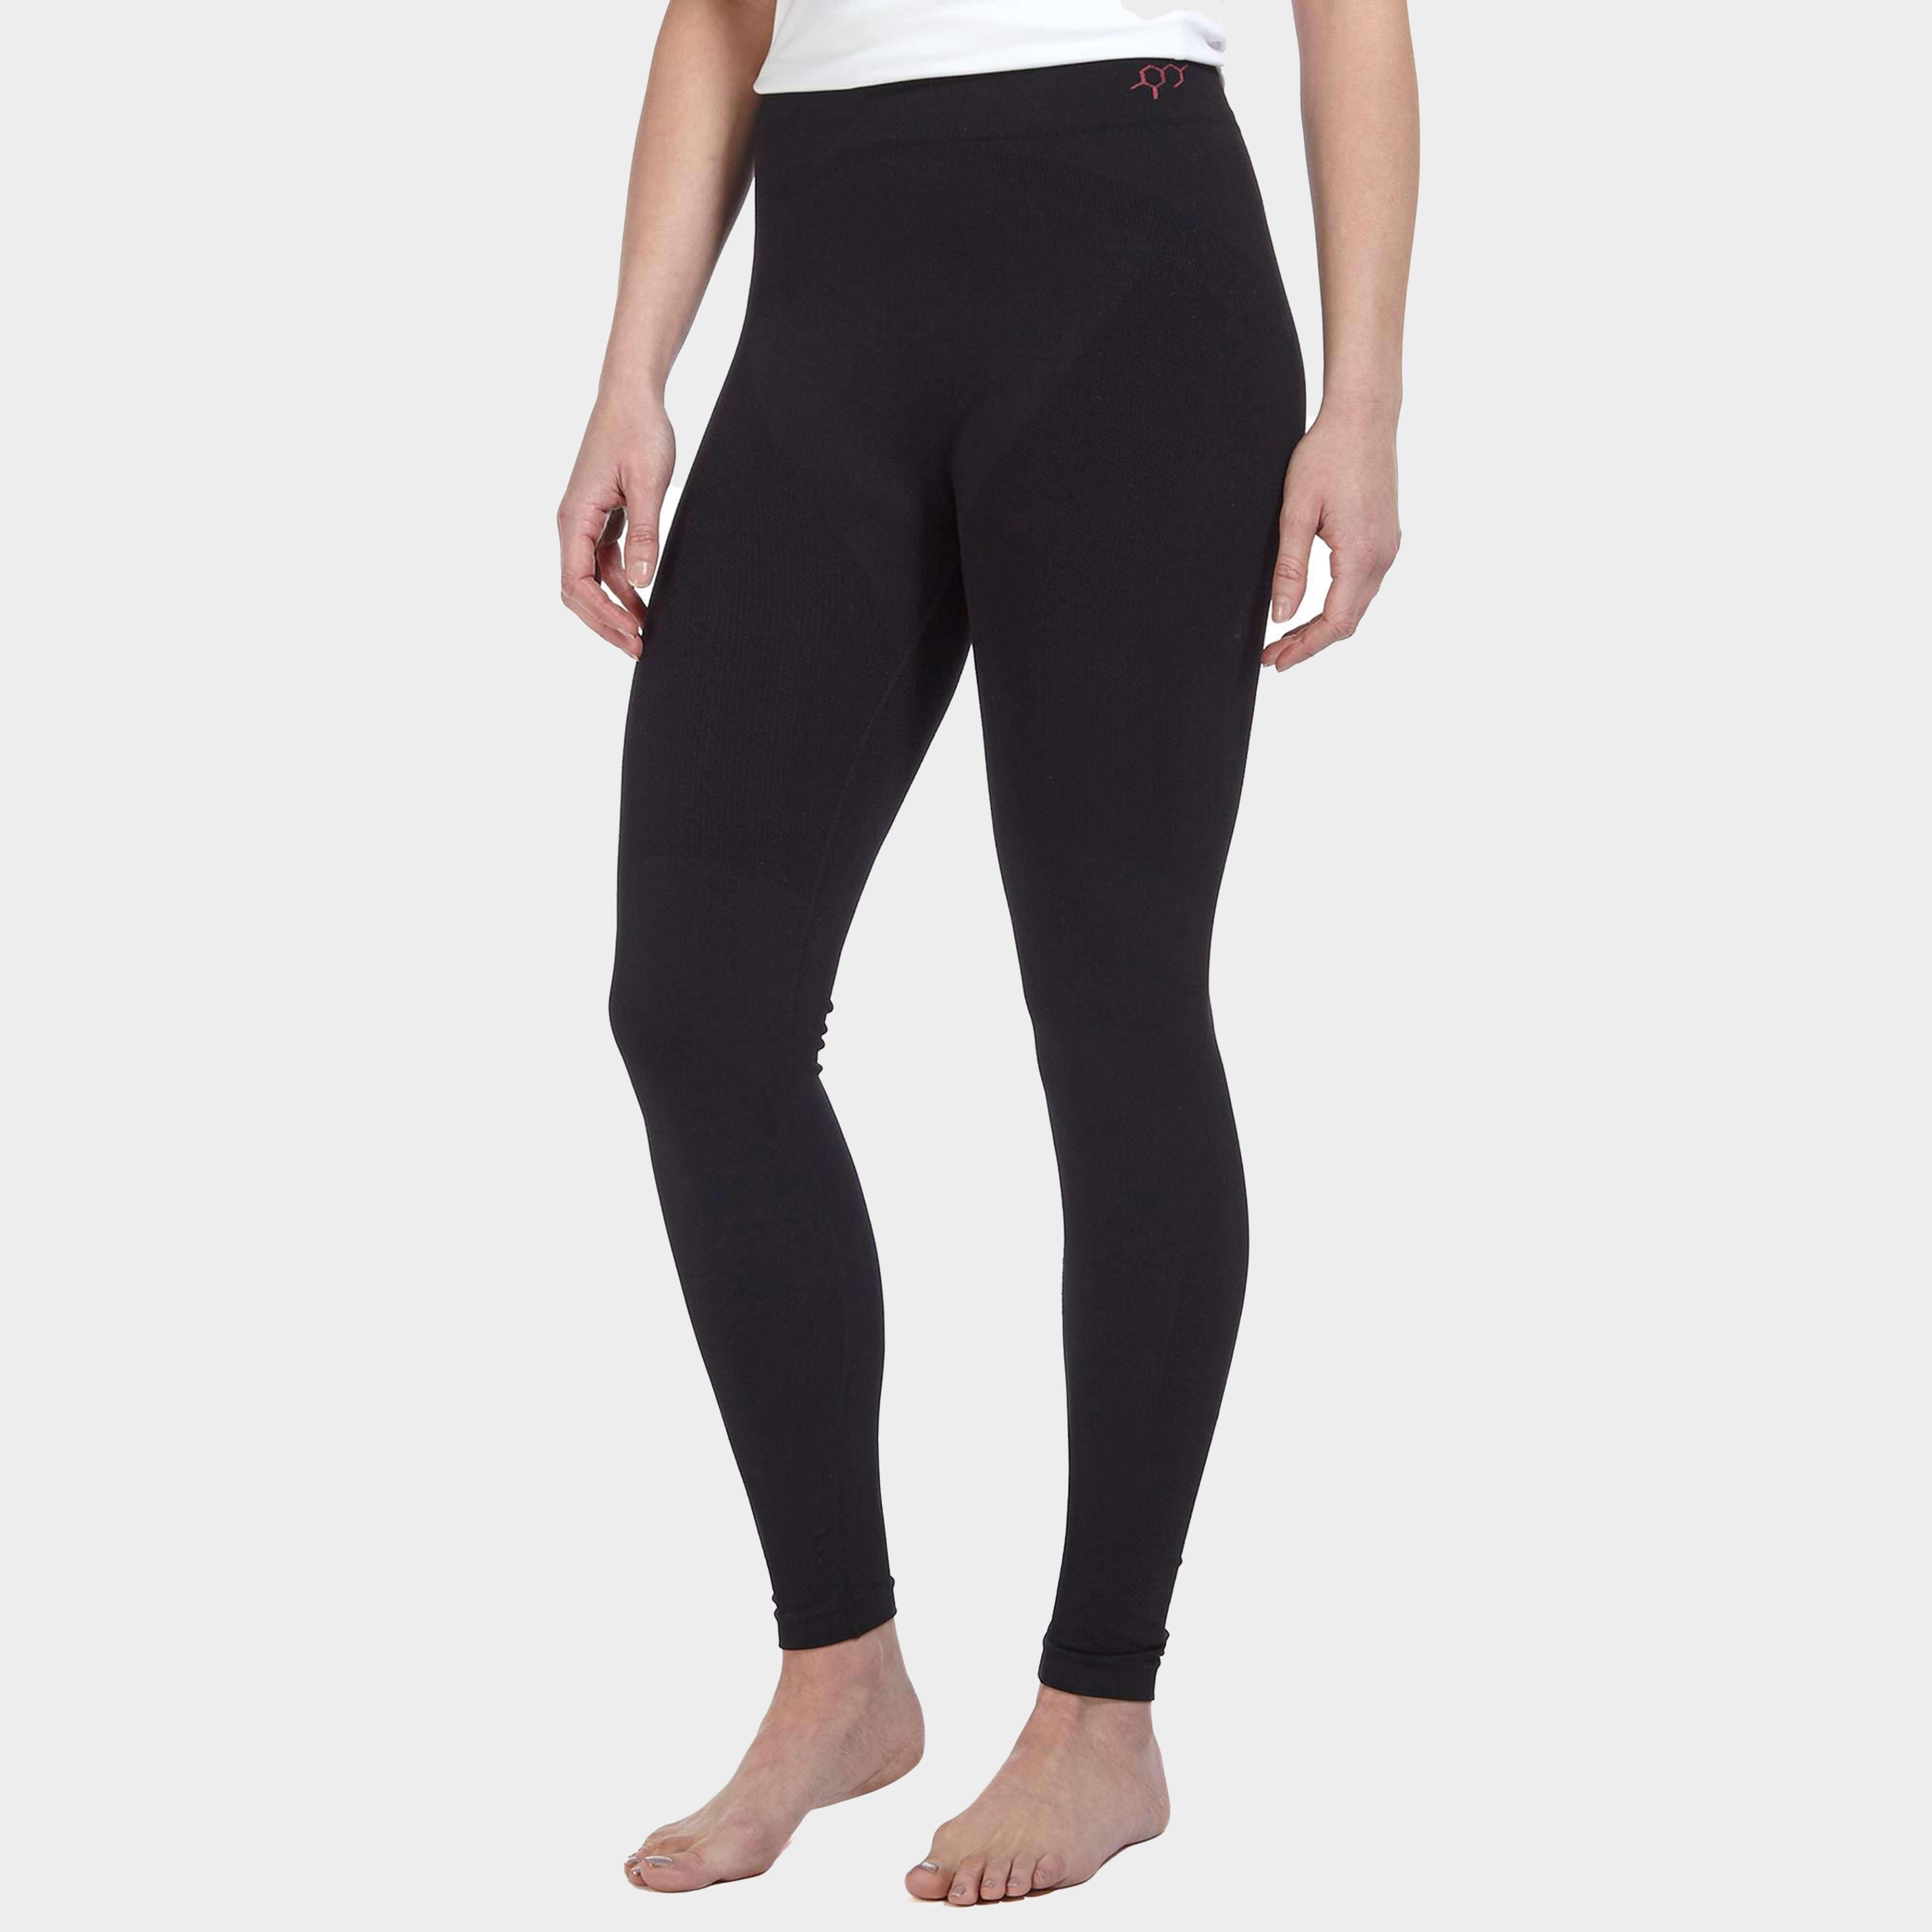 TECHNICALS Women's Seamless Baselayer Leggings